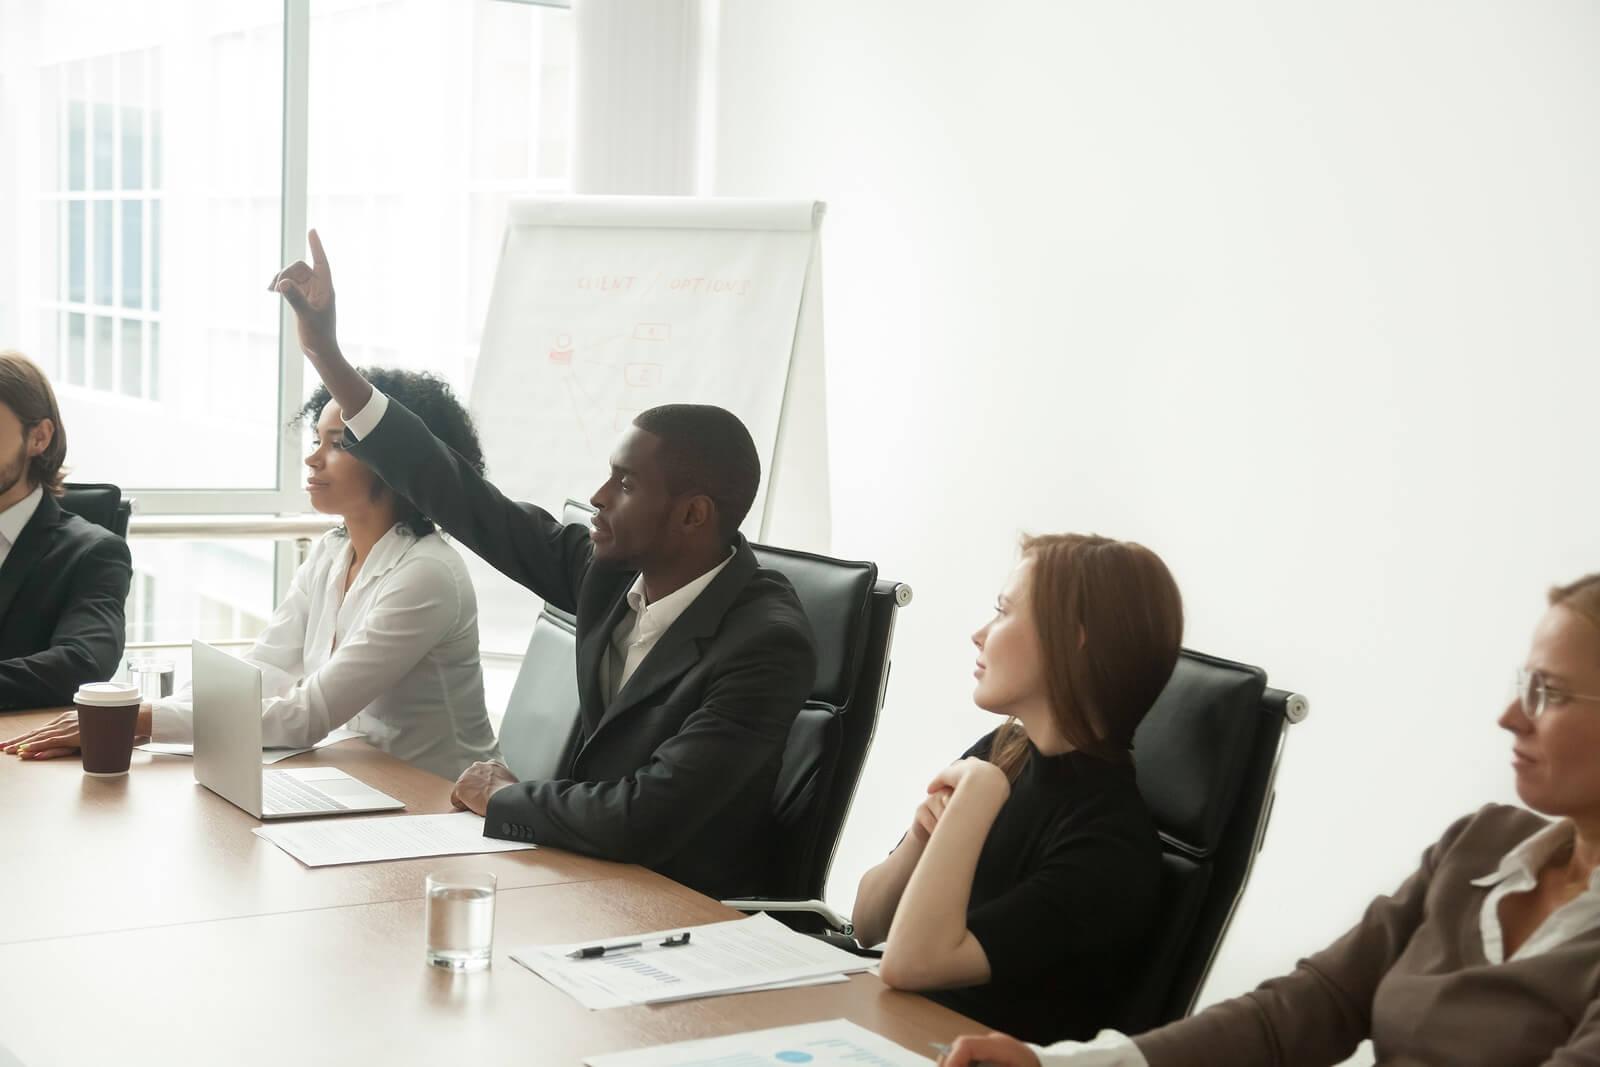 bigstock-African-Businessman-In-Suit-Ra-240397795